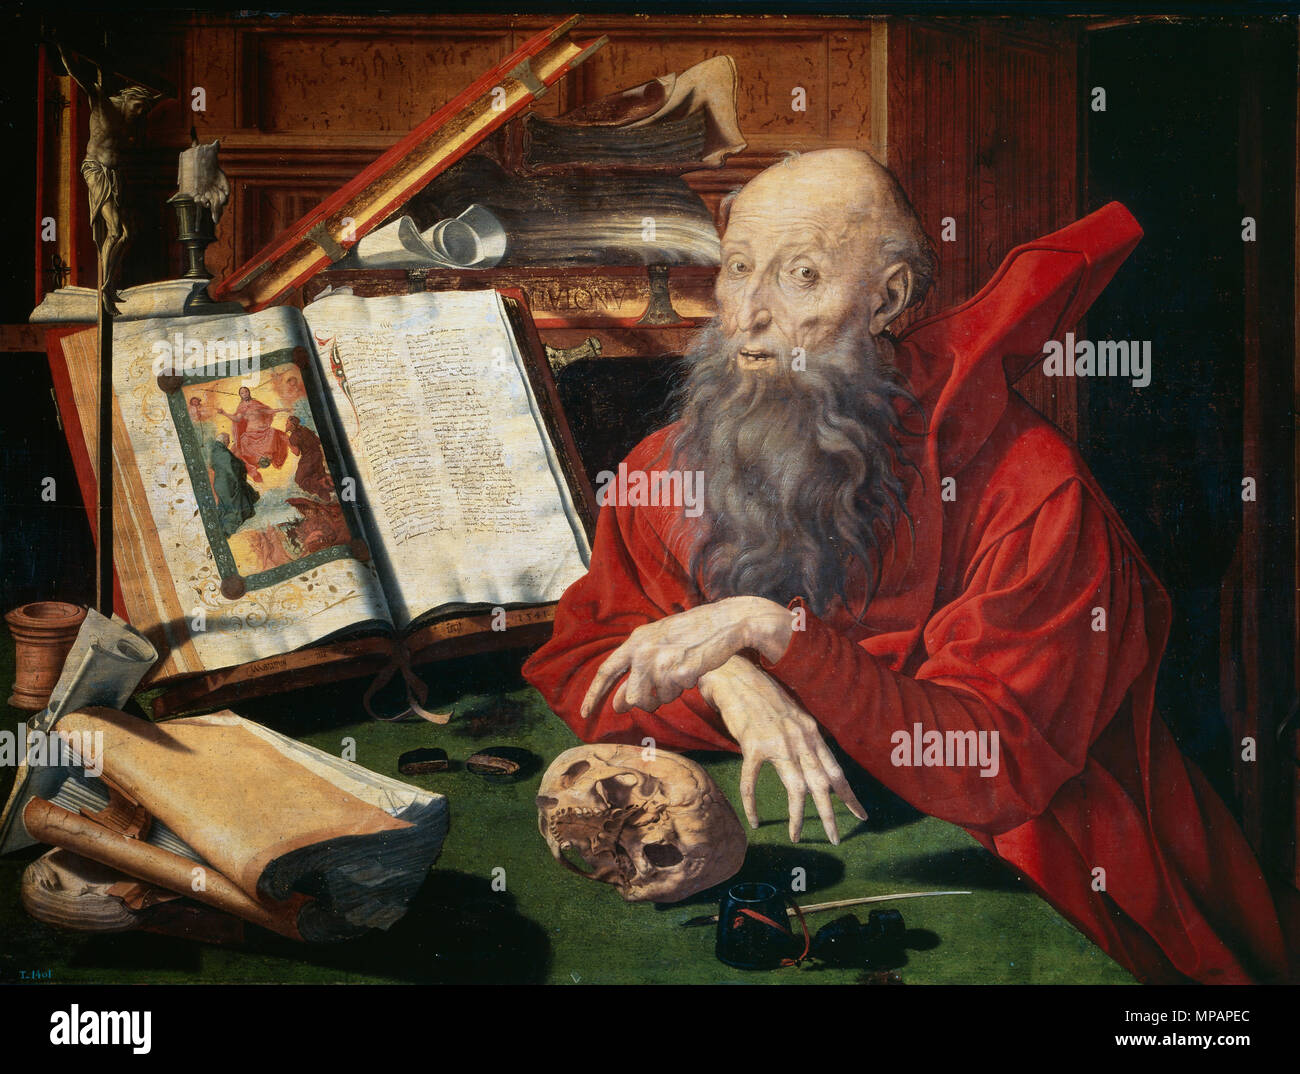 Реймерсвале, Маринус ван - это Что такое Реймерсвале